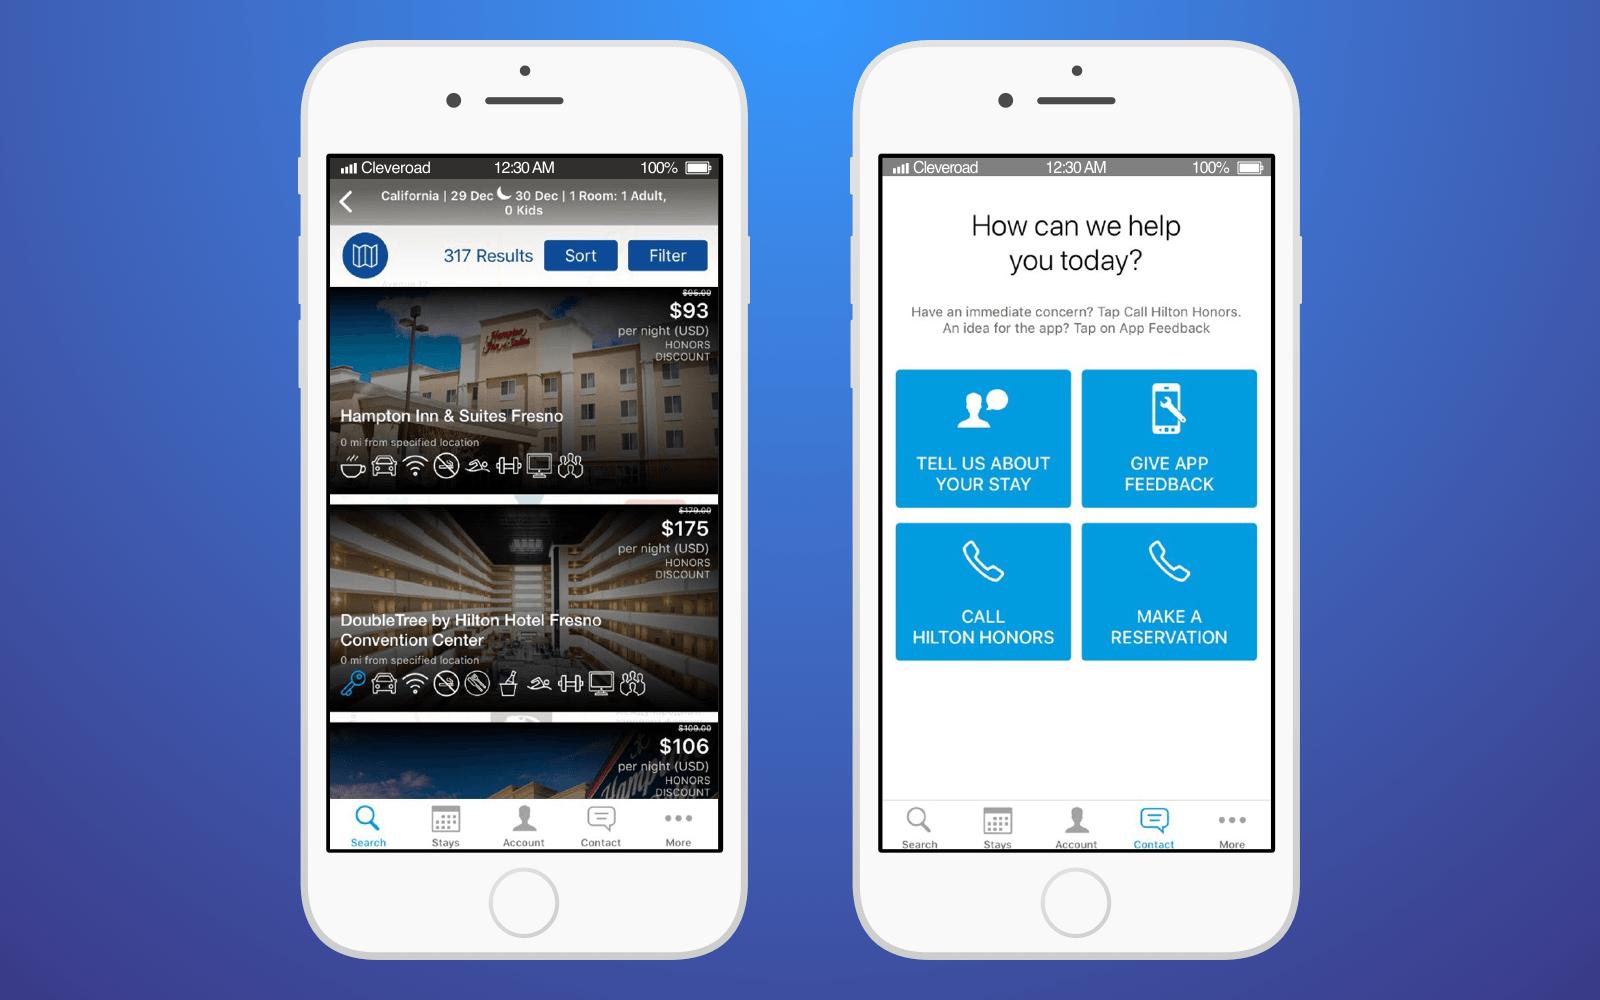 Hotel innovation: Hilton Honor app